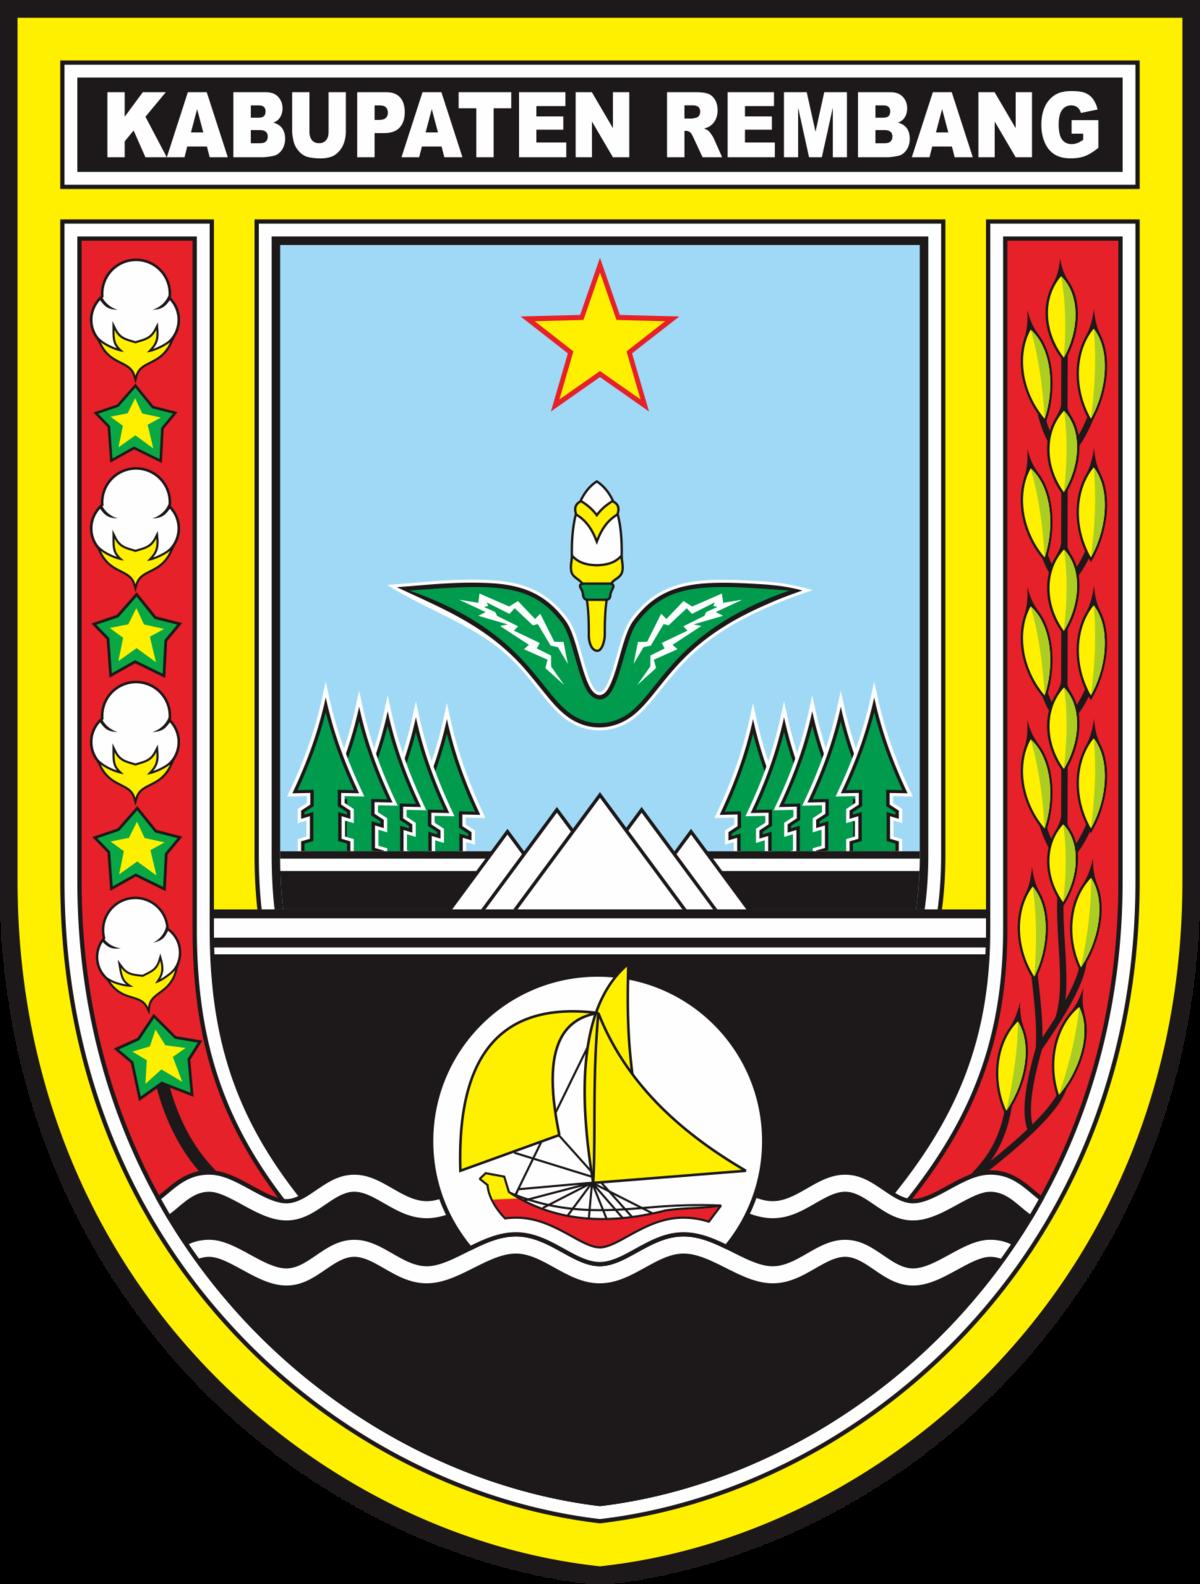 Kabupaten Rembang Wikipedia Bahasa Indonesia Ensiklopedia Bebas Situs Sejarah Kota